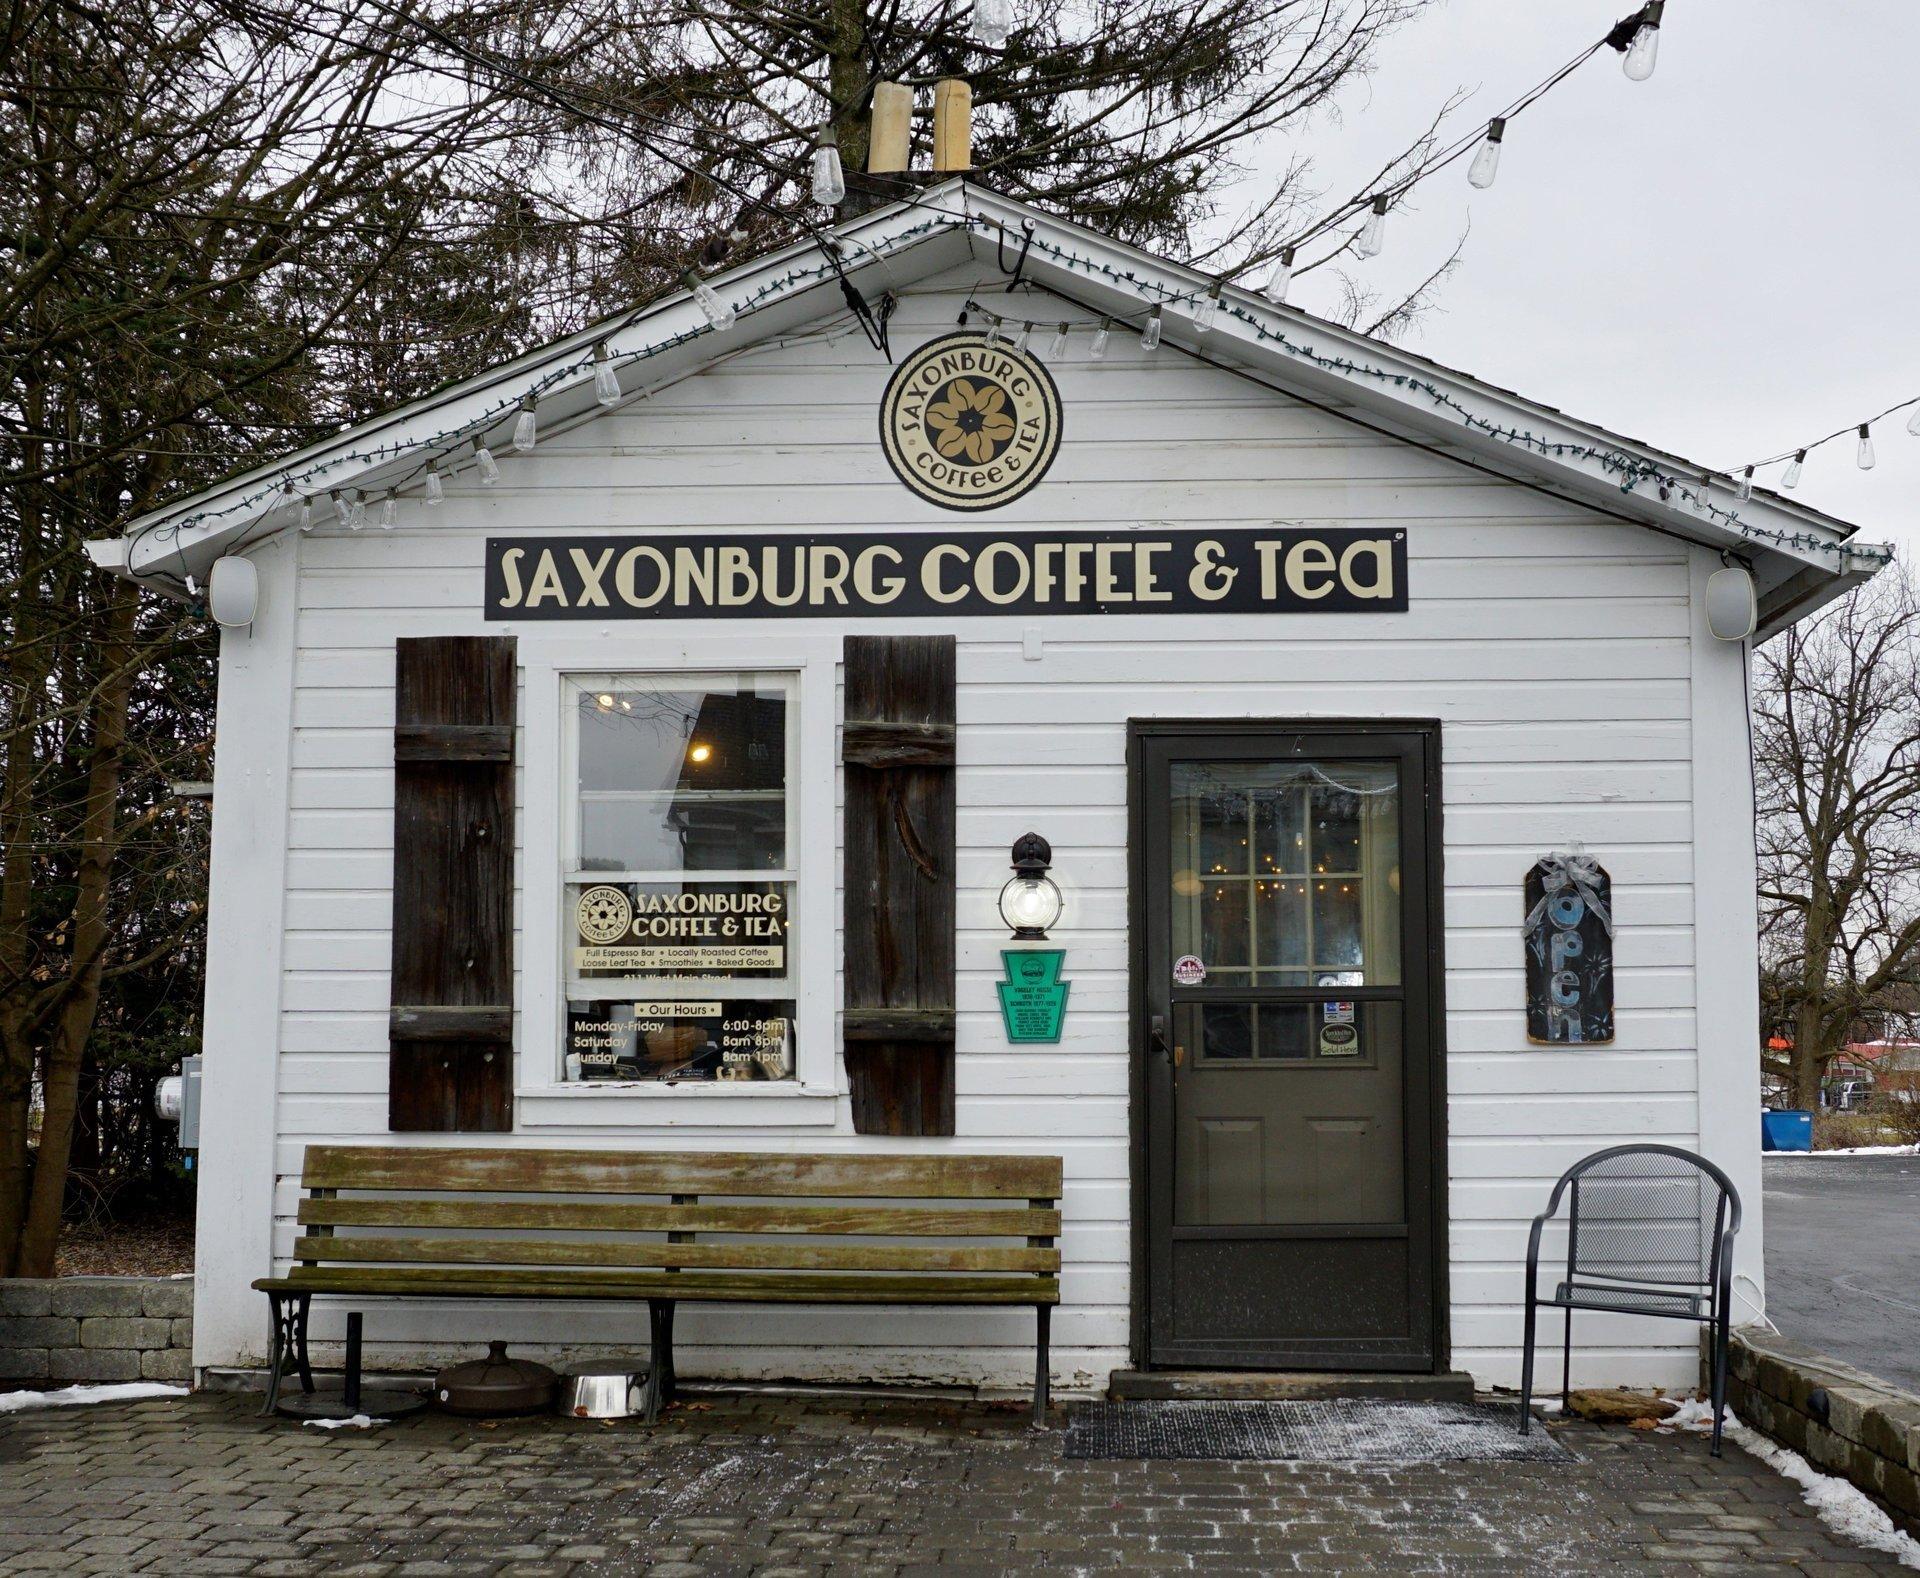 Saxonburg Coffee & Tea image 9